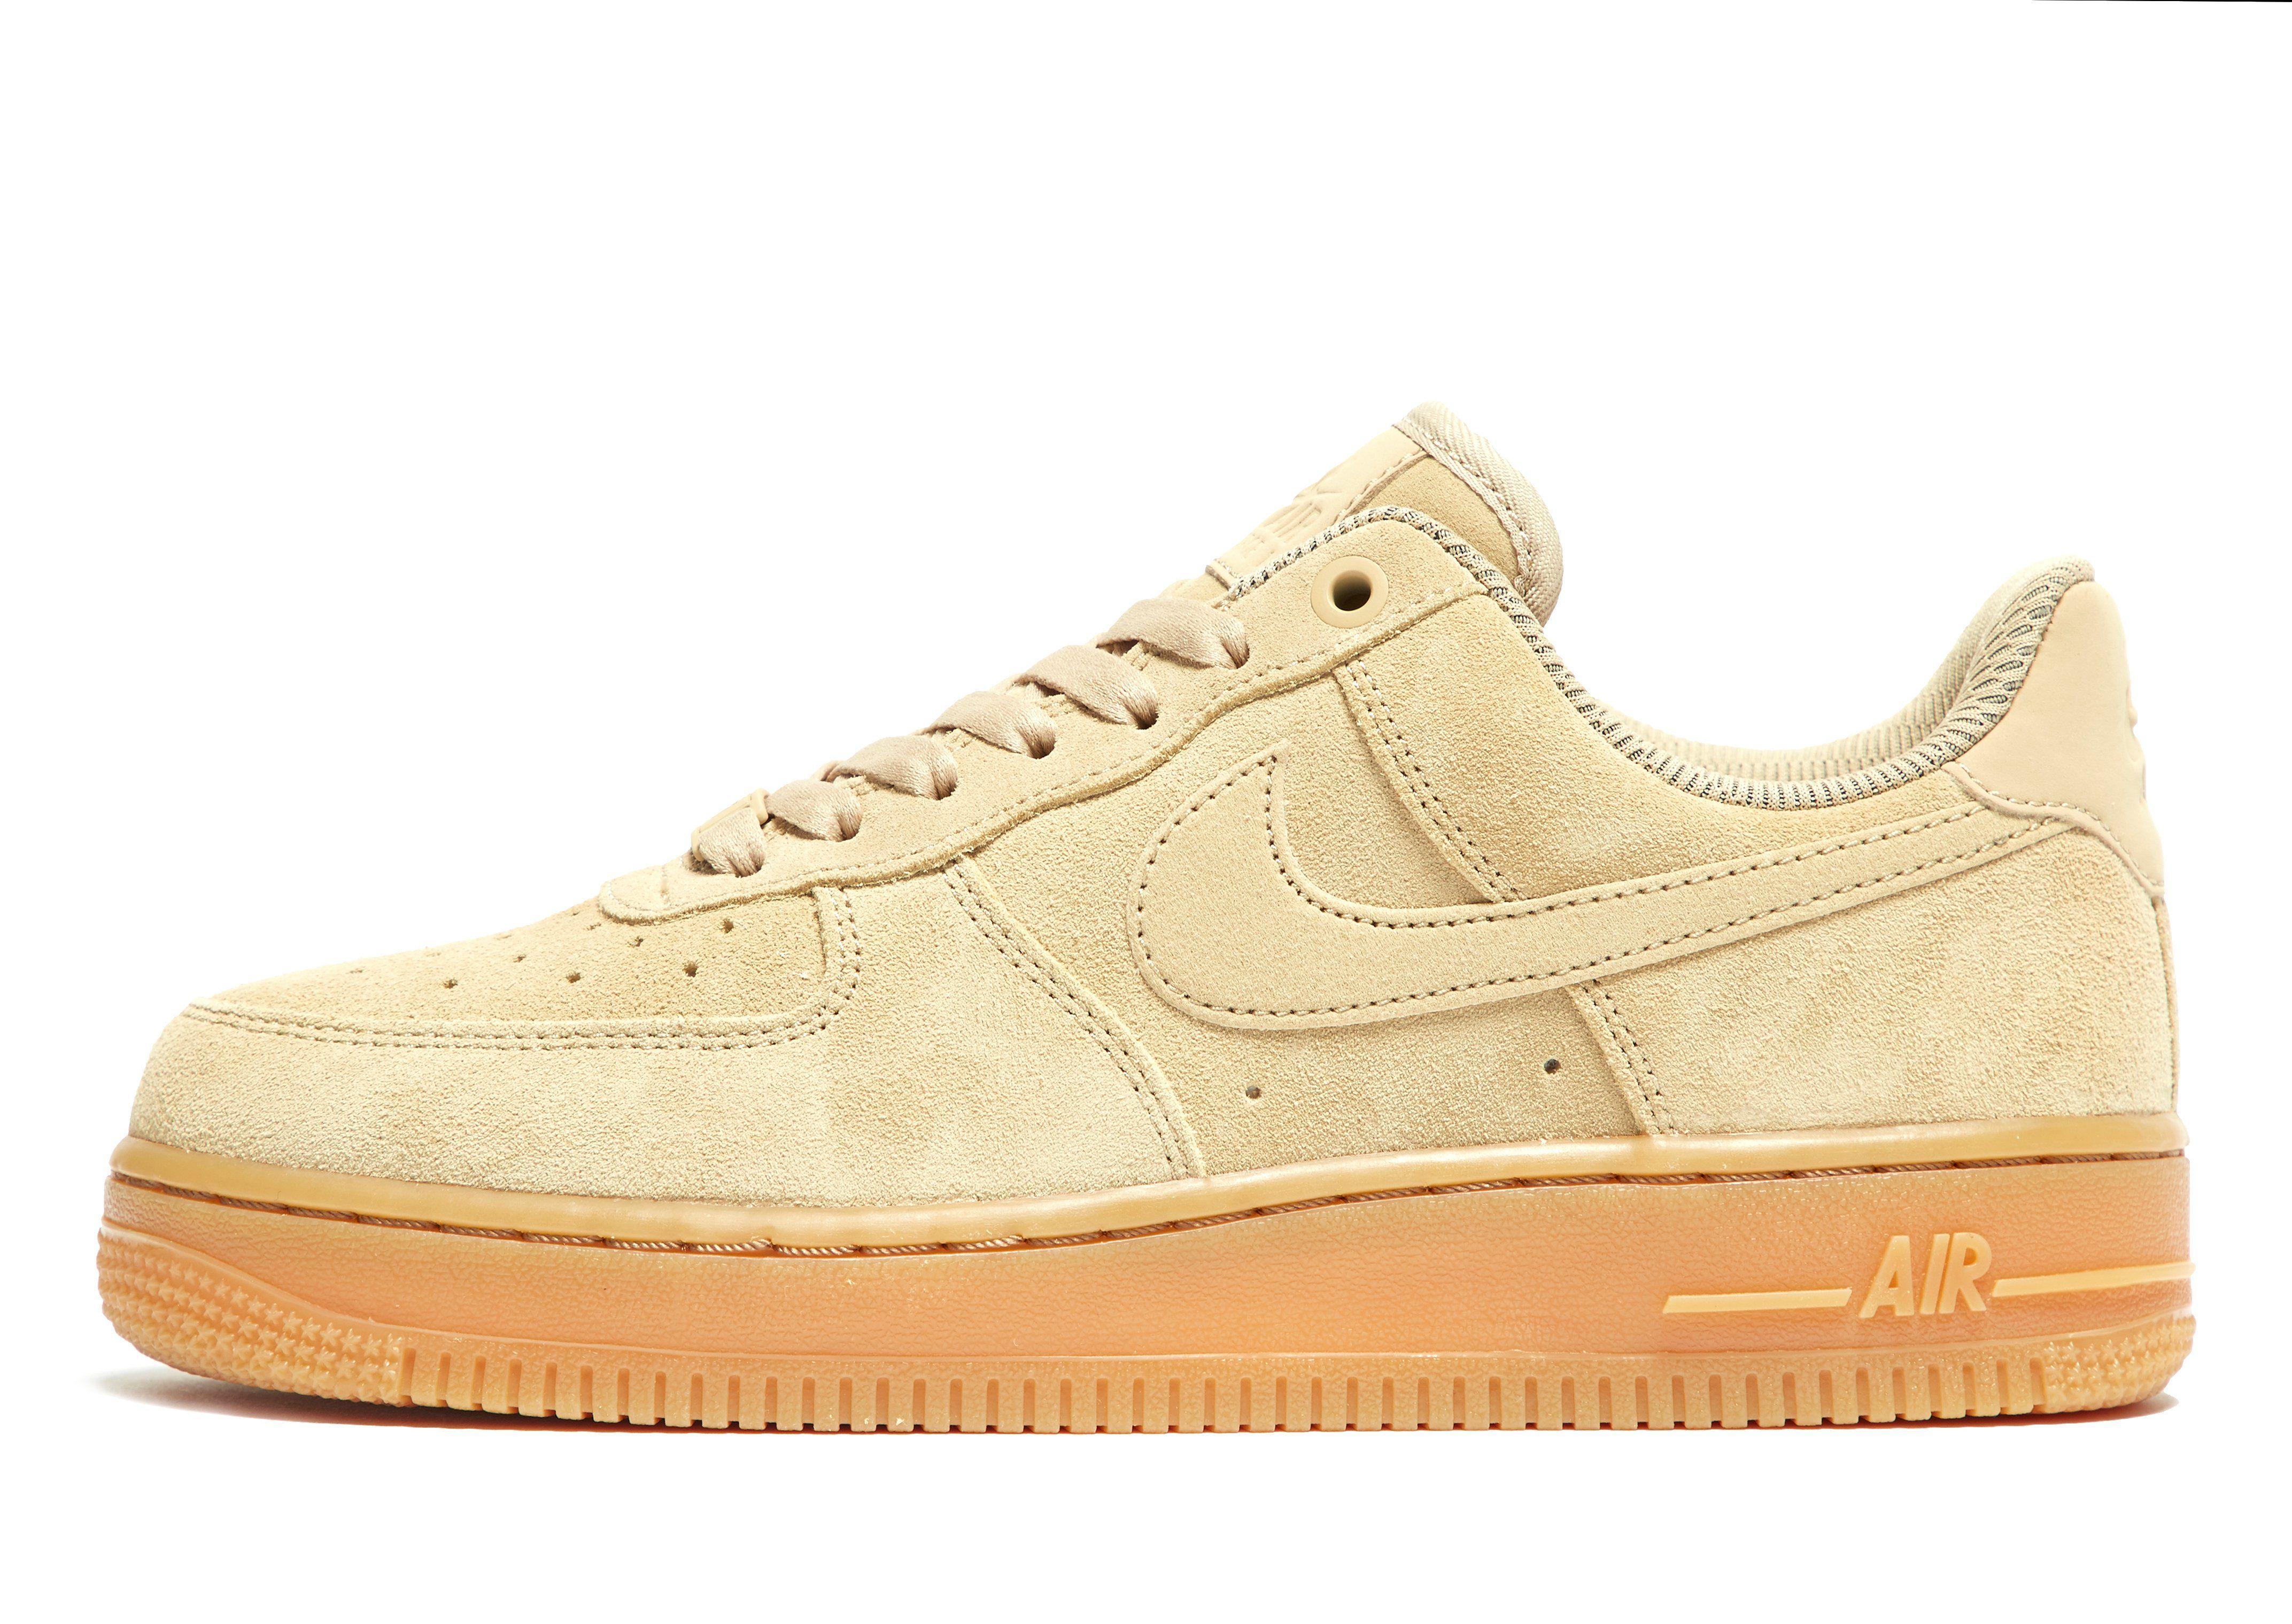 Nike Air Force 1 Femme